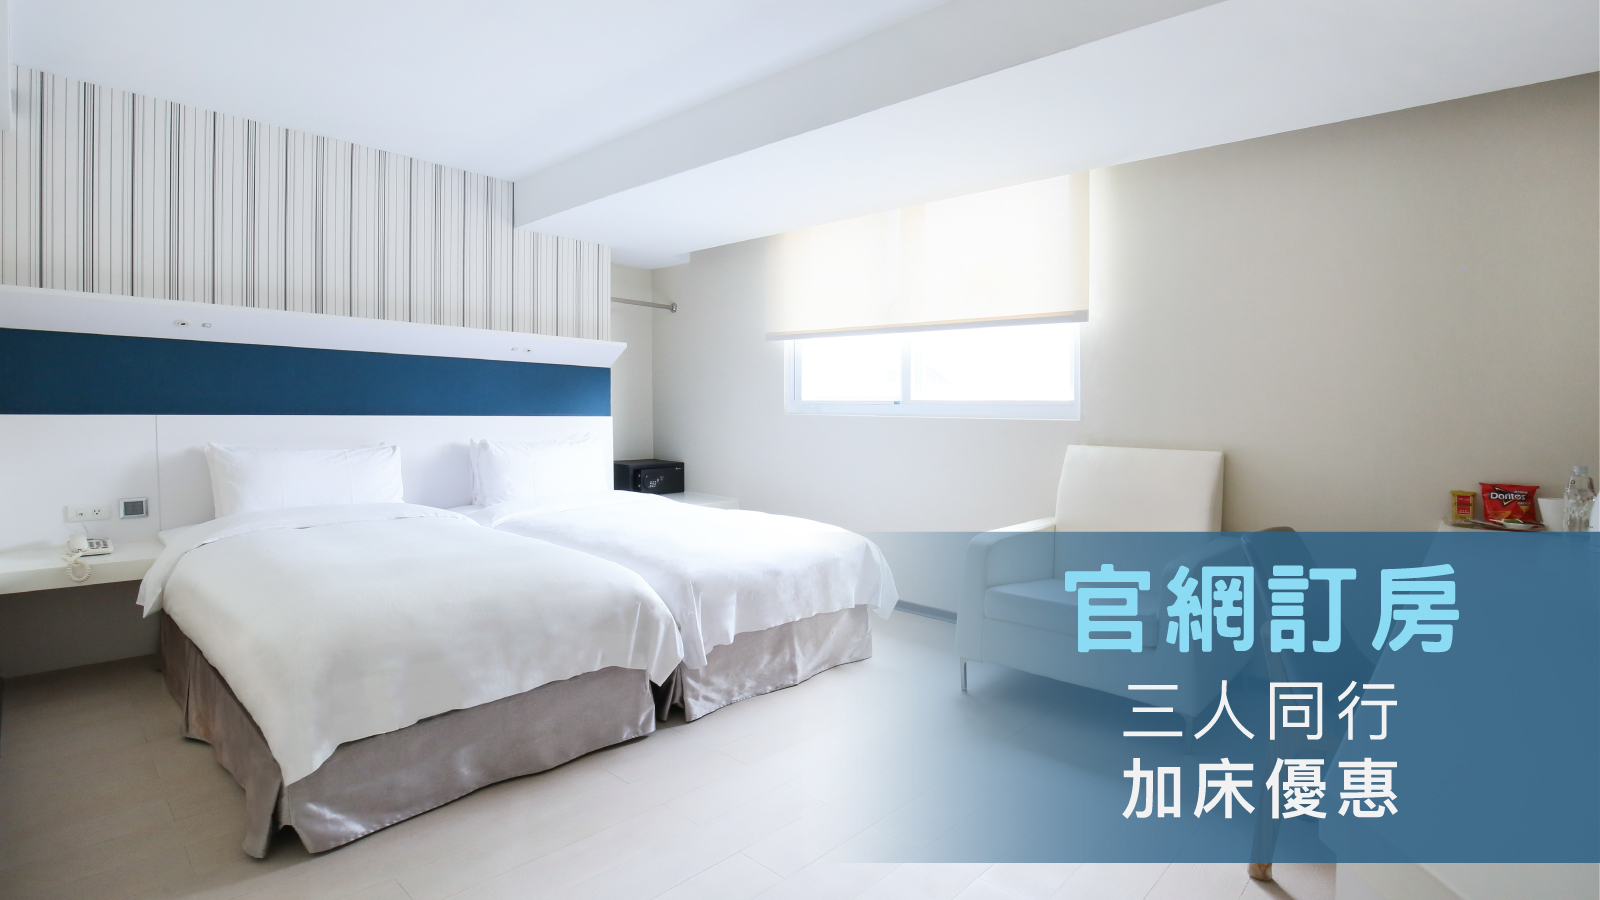 https://booking.taipeiinngroup.com/nv/images/suite/526_109thumb.jpg